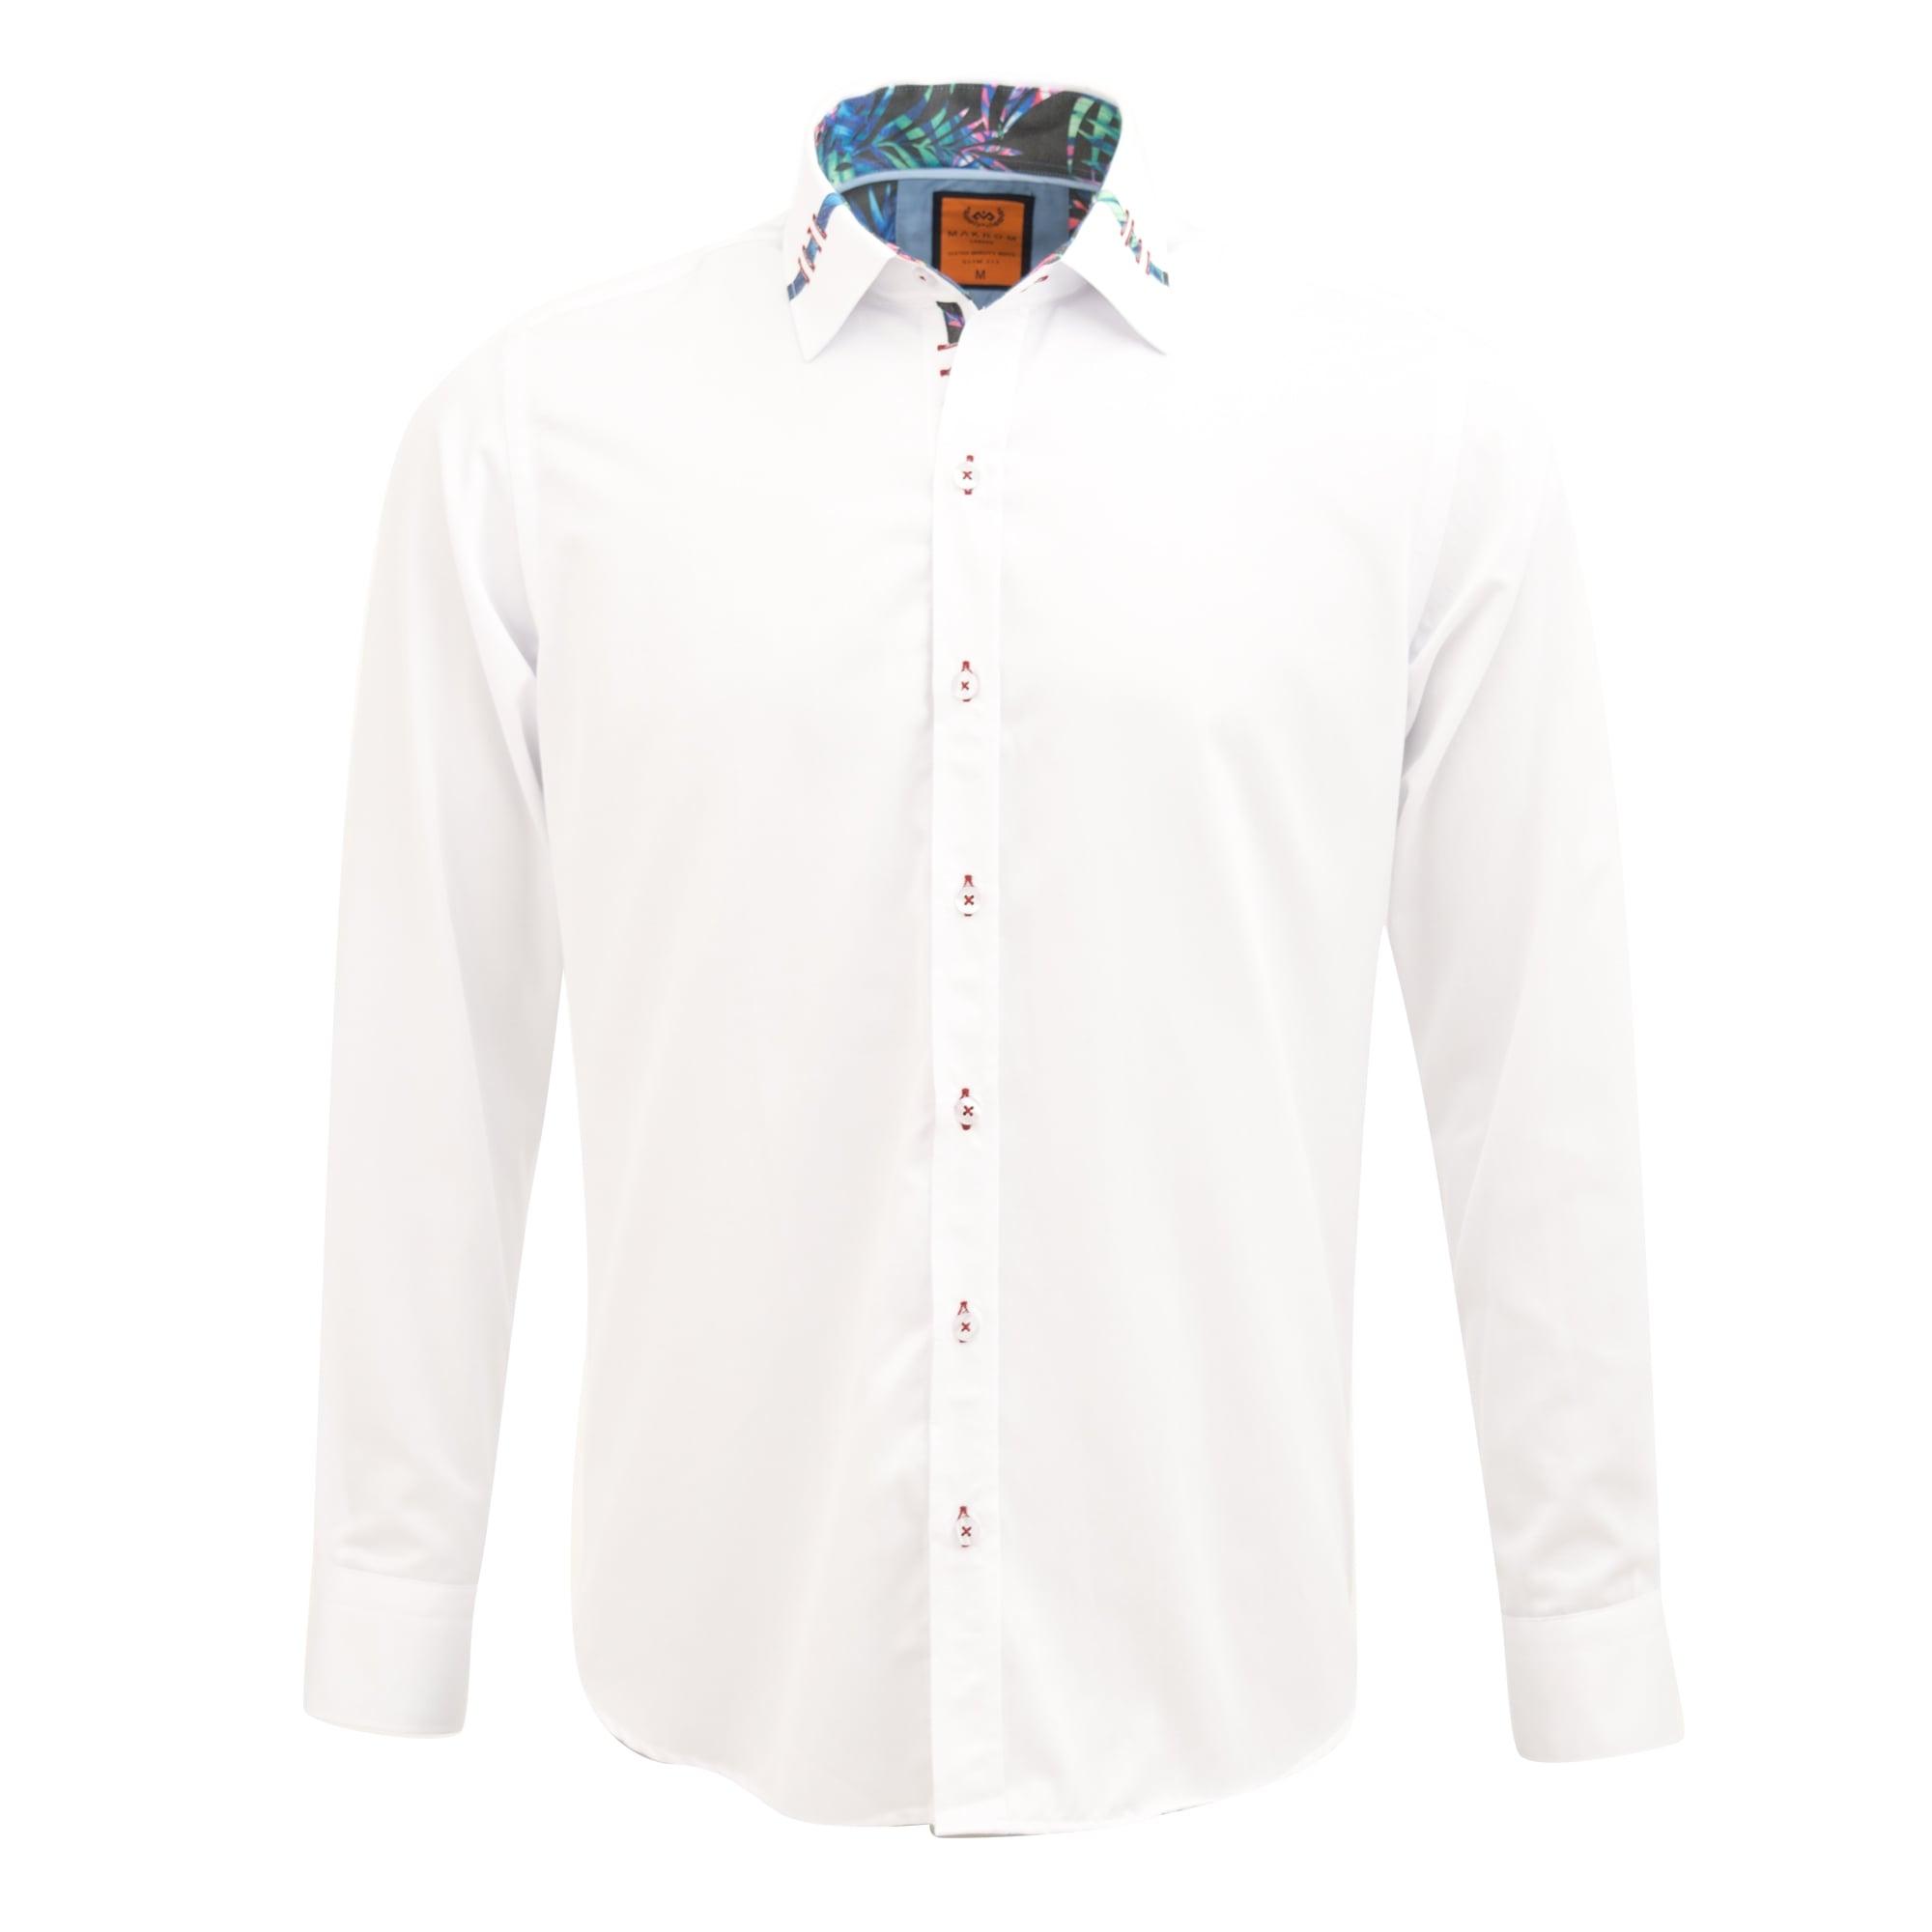 Oscar Banks Tropical Trim Collar Design Print Smart Casual Occasion Mens Shirt